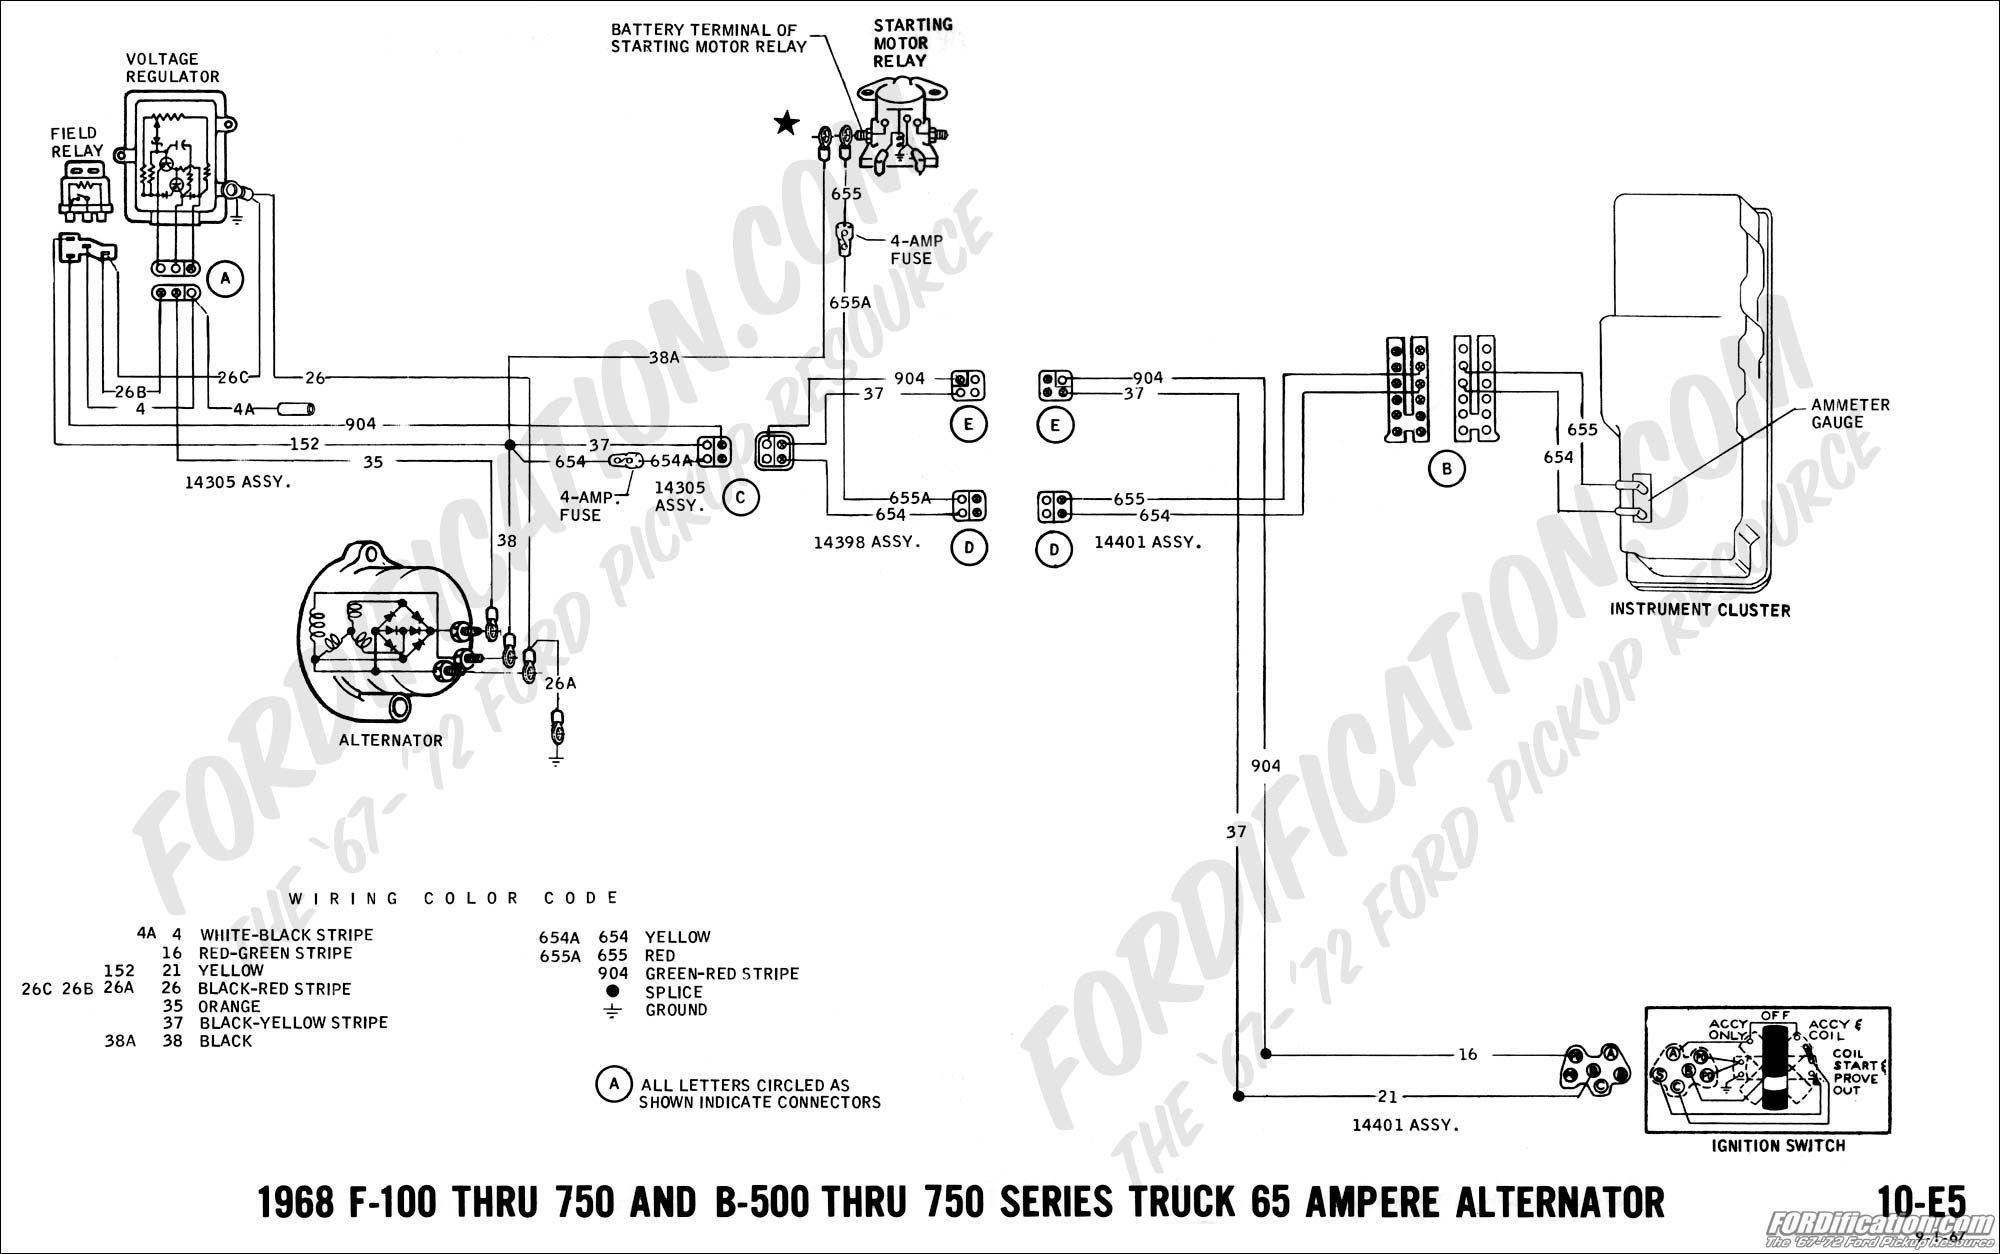 hight resolution of alternator wiring diagram honda best wiring diagram alternator voltage regulator fresh 4 wire alternator